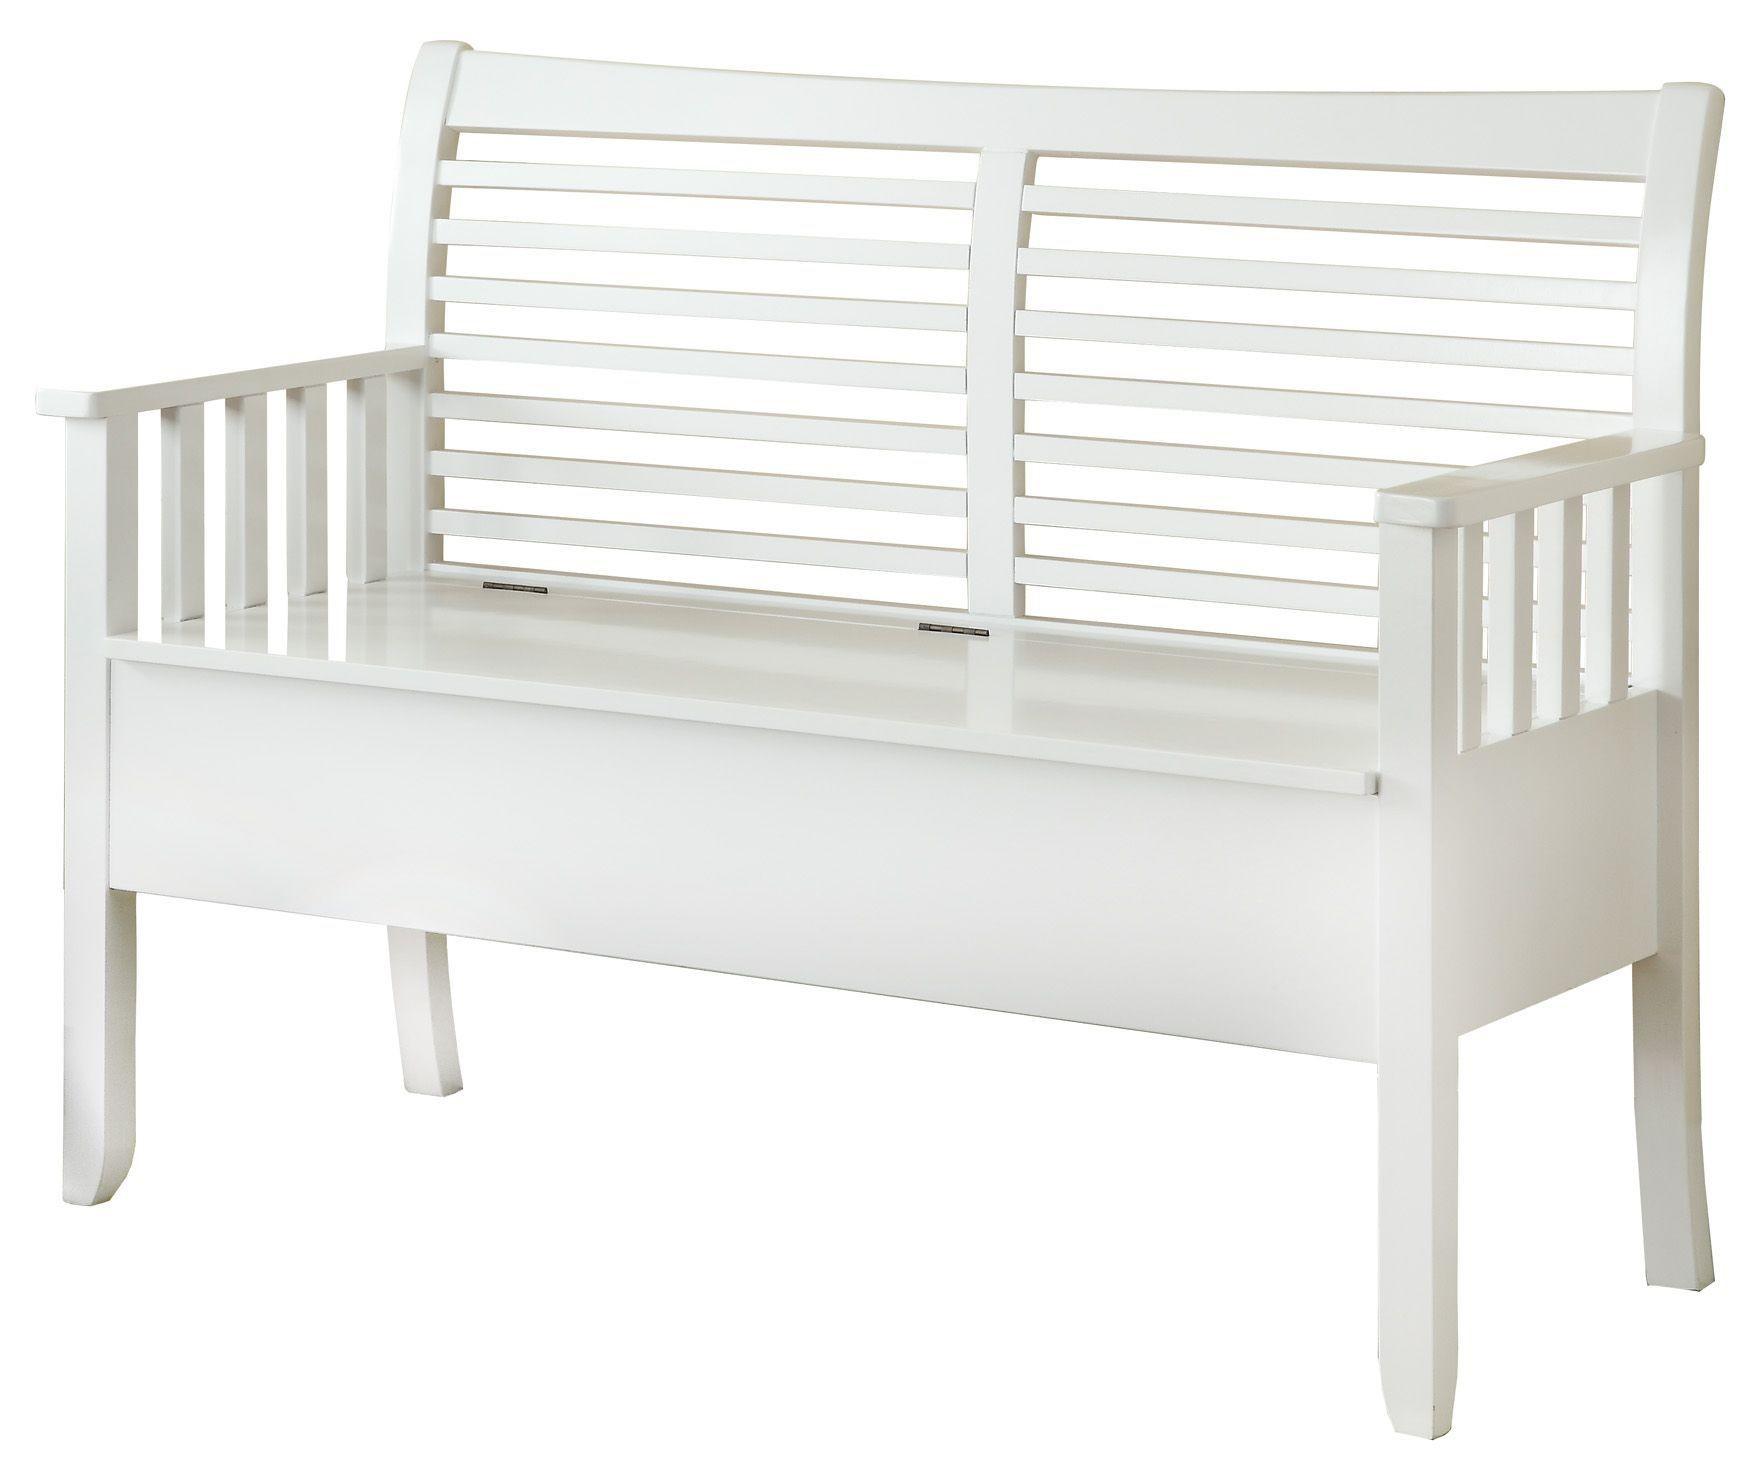 4506 white solid wood storage bench i 4506 monarch. Black Bedroom Furniture Sets. Home Design Ideas